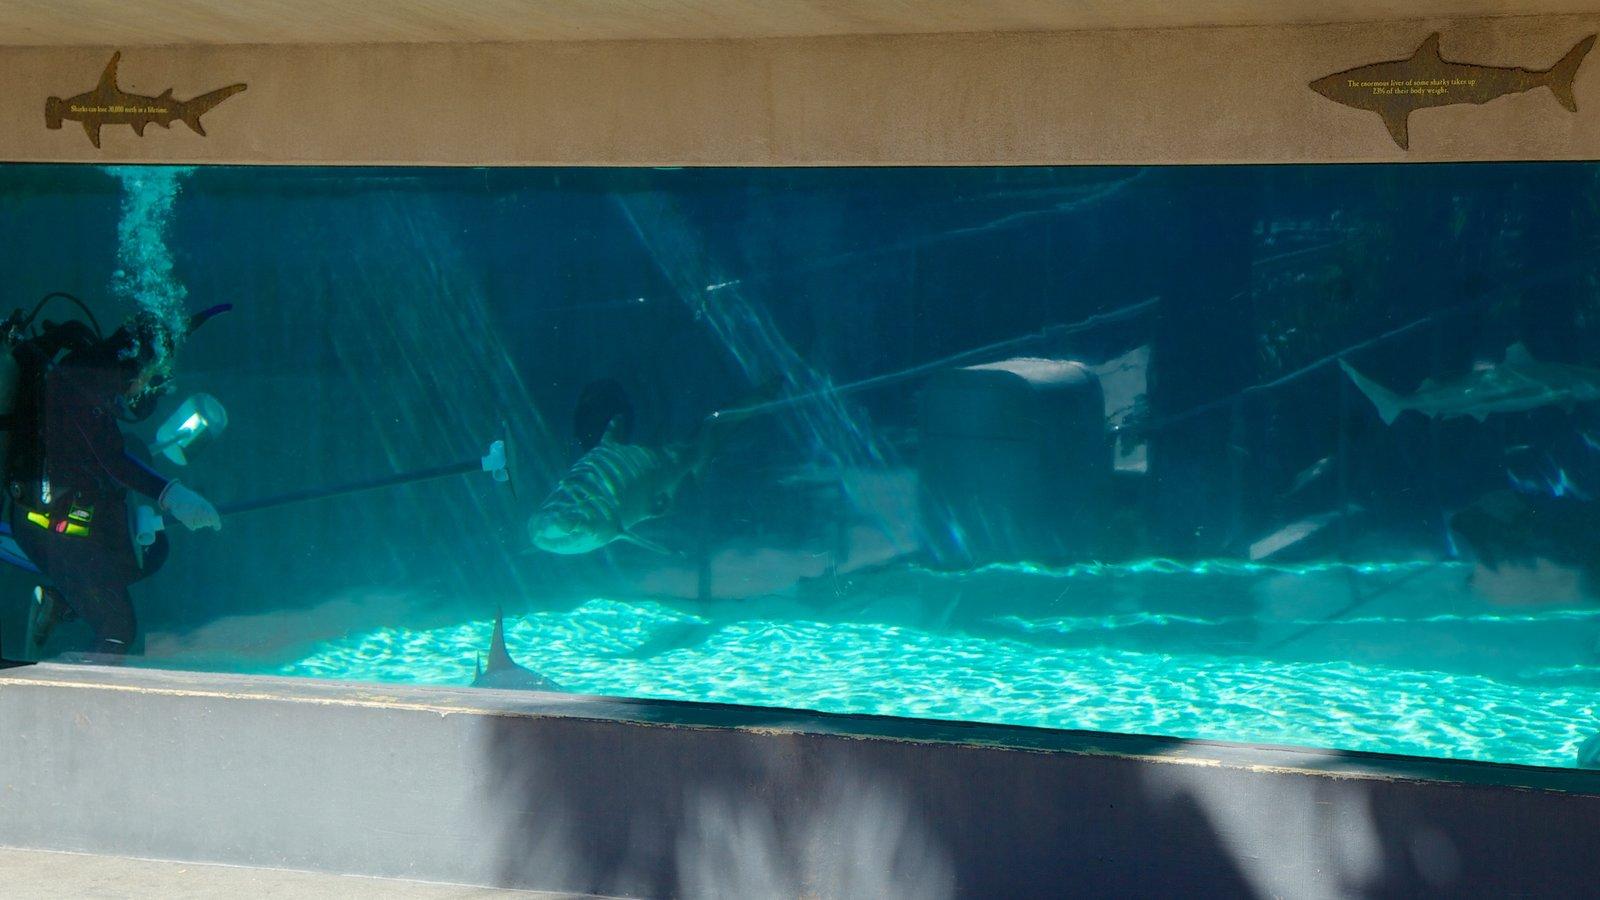 Aquarium Of The Pacific Pictures View Photos Images Of